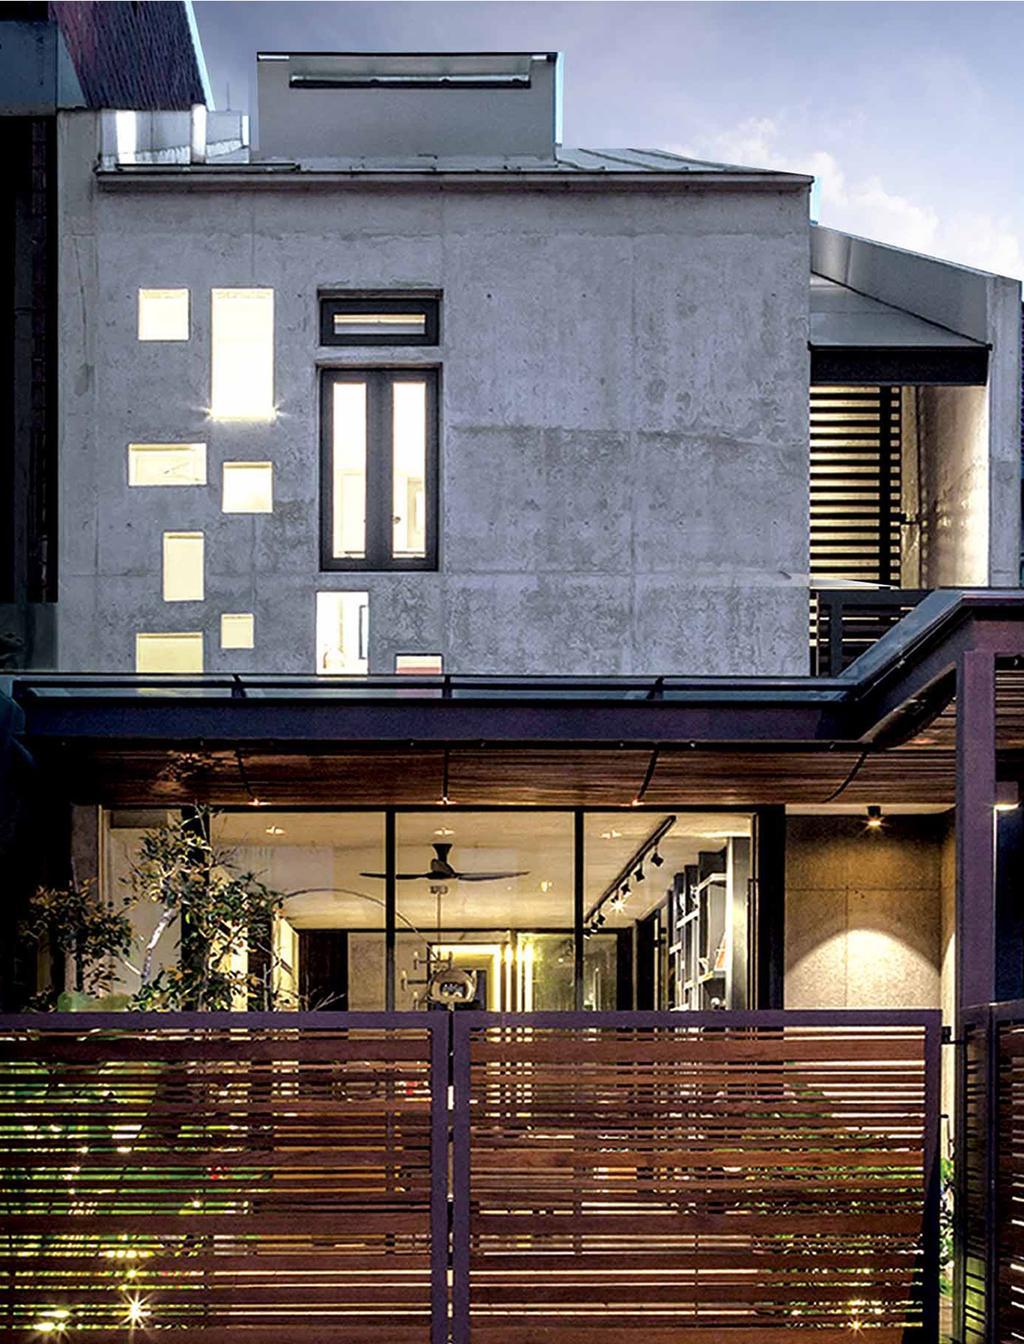 Contemporary, Landed, Belimbing Avenue, Architect, HYLA Architects, Flora, Jar, Plant, Potted Plant, Pottery, Vase